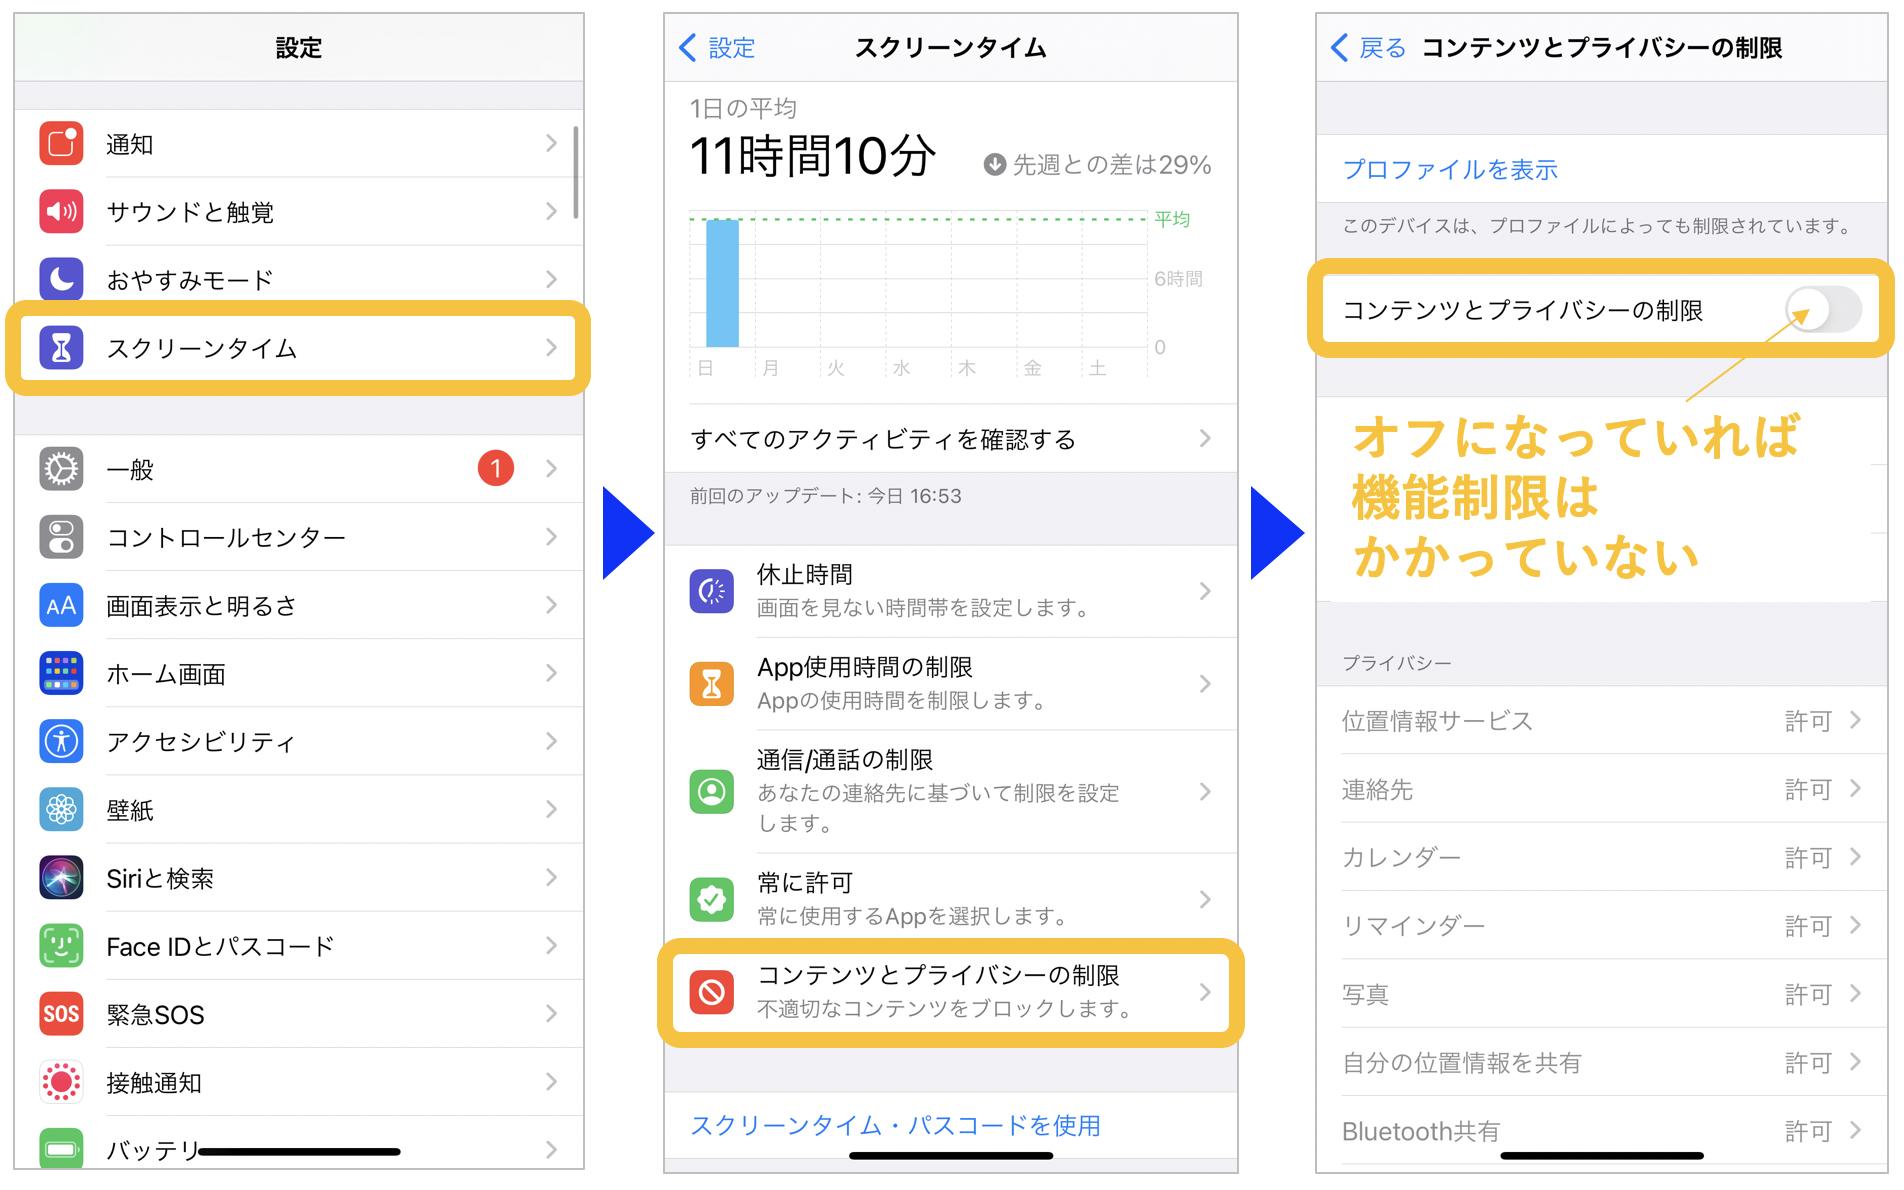 iPhoneの機能制限の確認方法